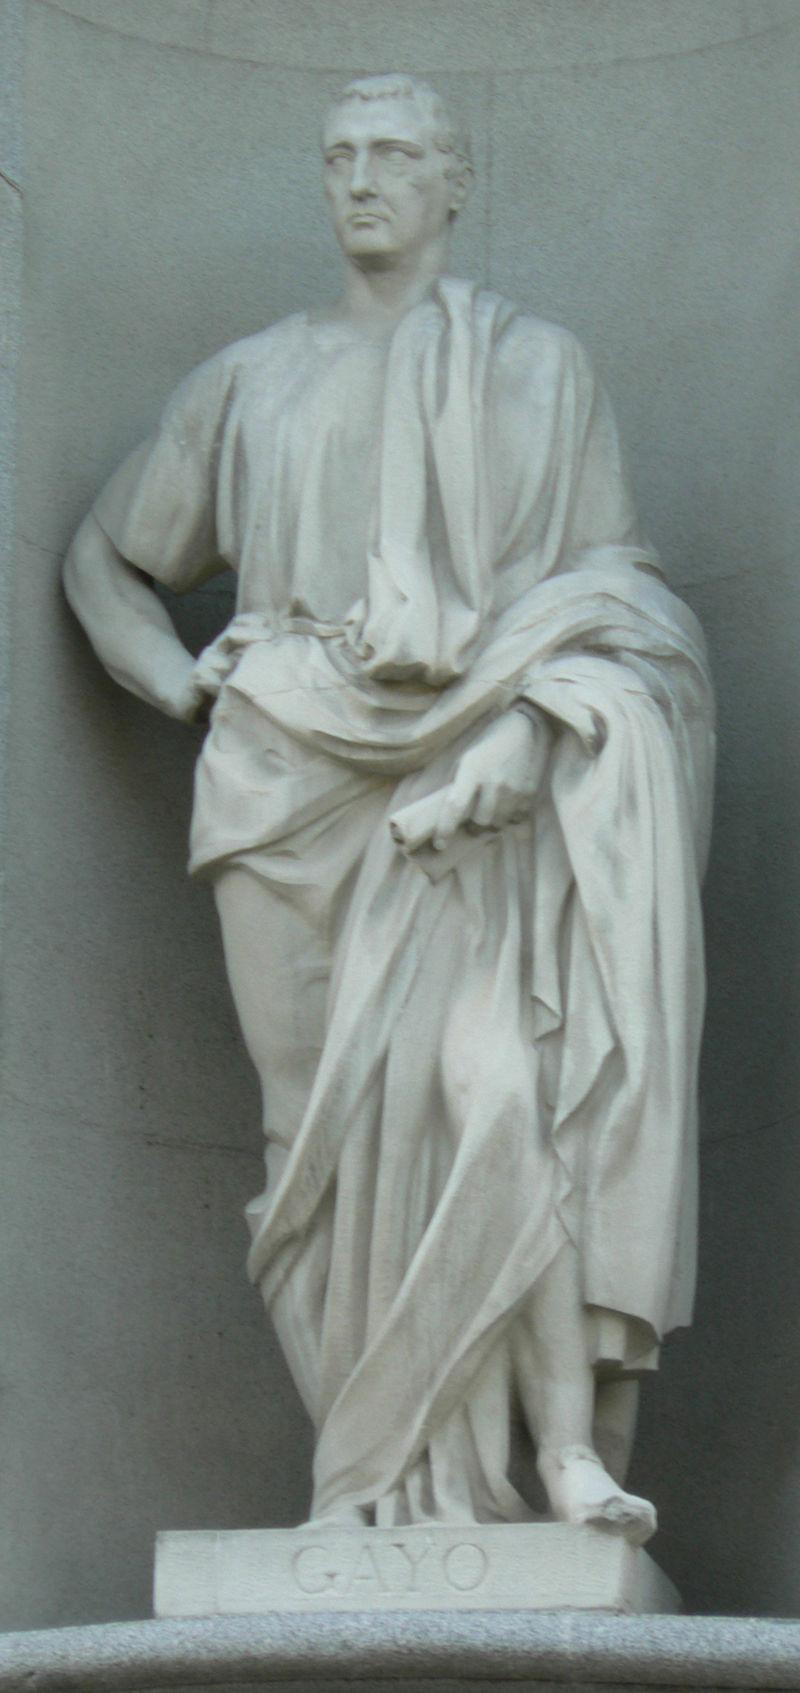 Gaius. Afbeelding: Basilio (via Wikimedia Commons).